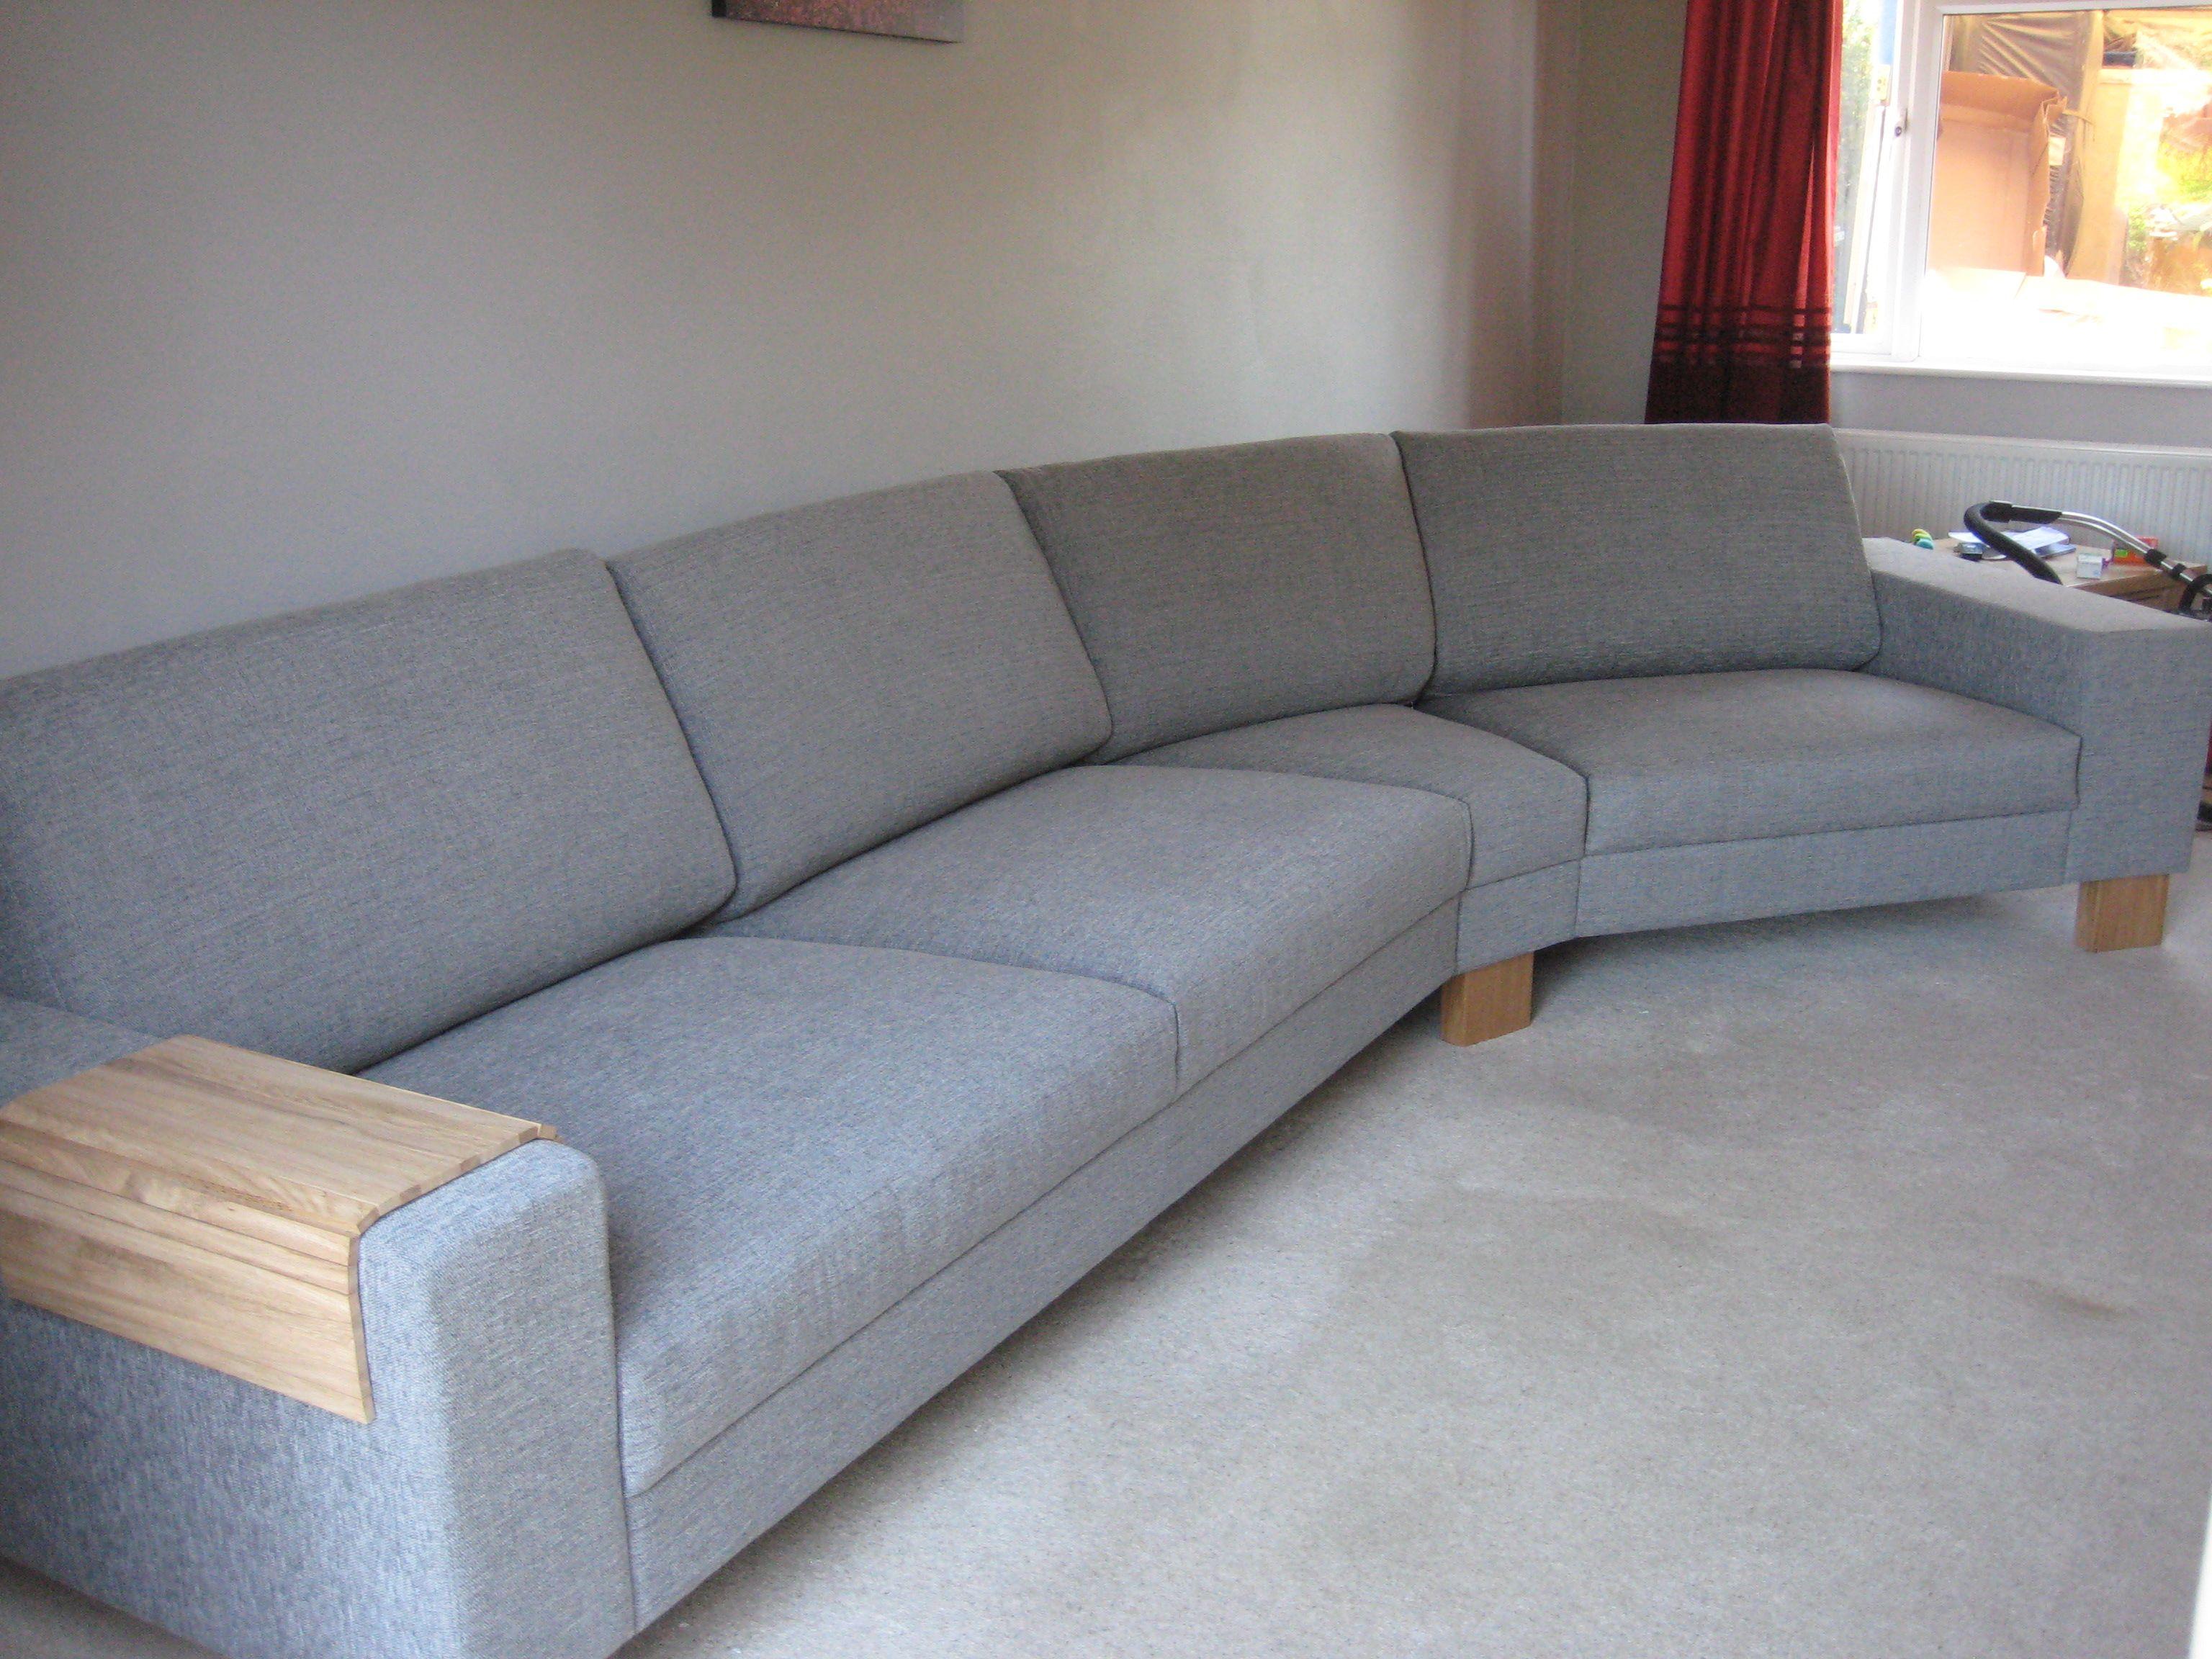 sectional sofa sofa sectional